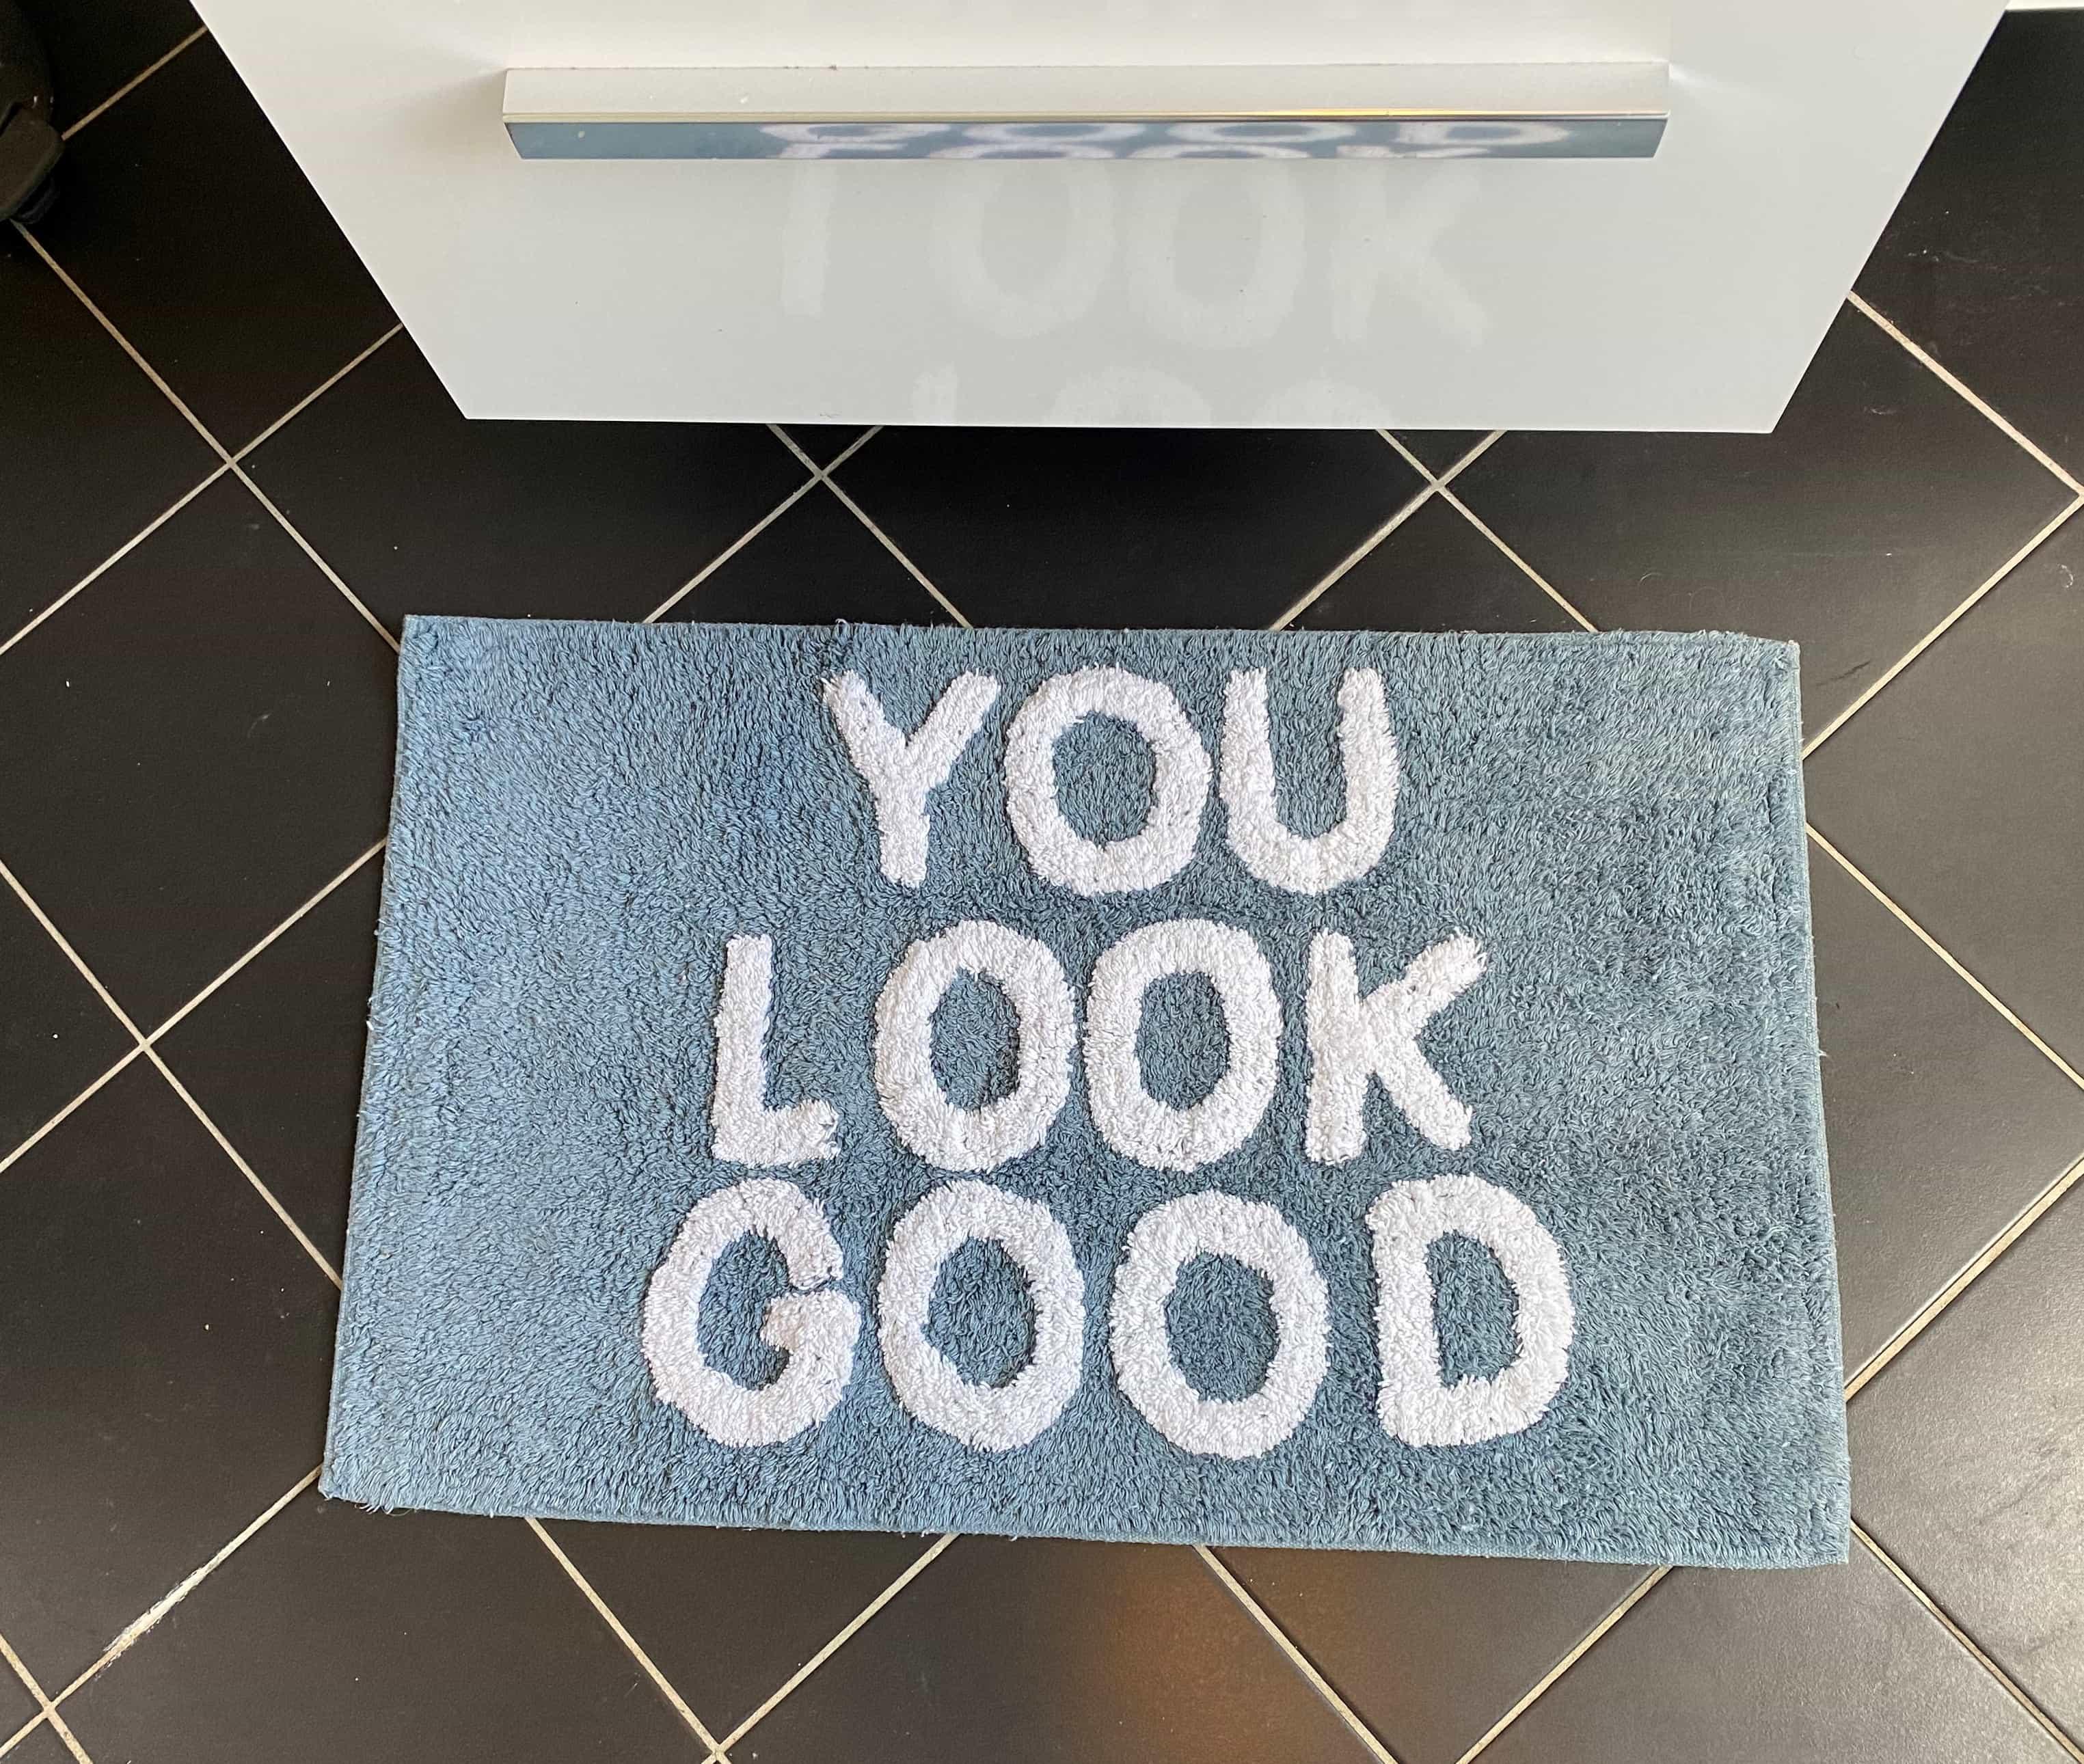 4goodz Zachte Badmat Blauw 'You Look Good' - badkamermat - 50 x 80 cm